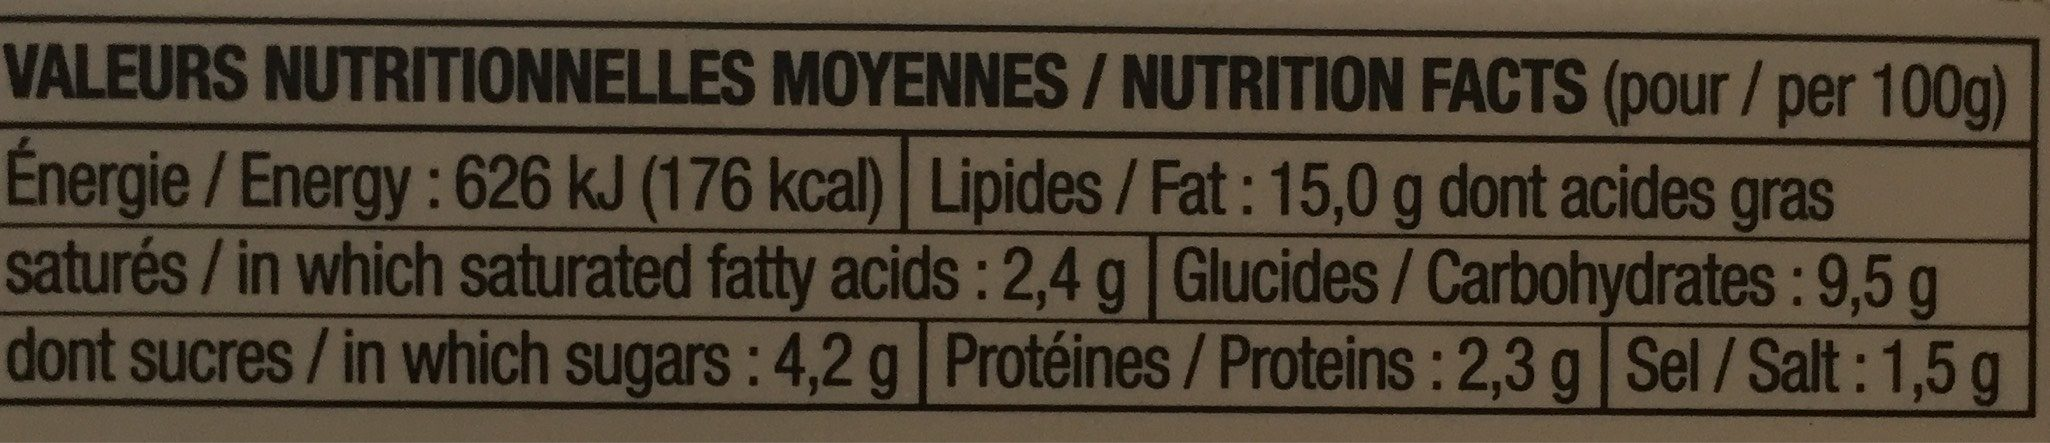 Sakade d'algues kombu - Nutrition facts